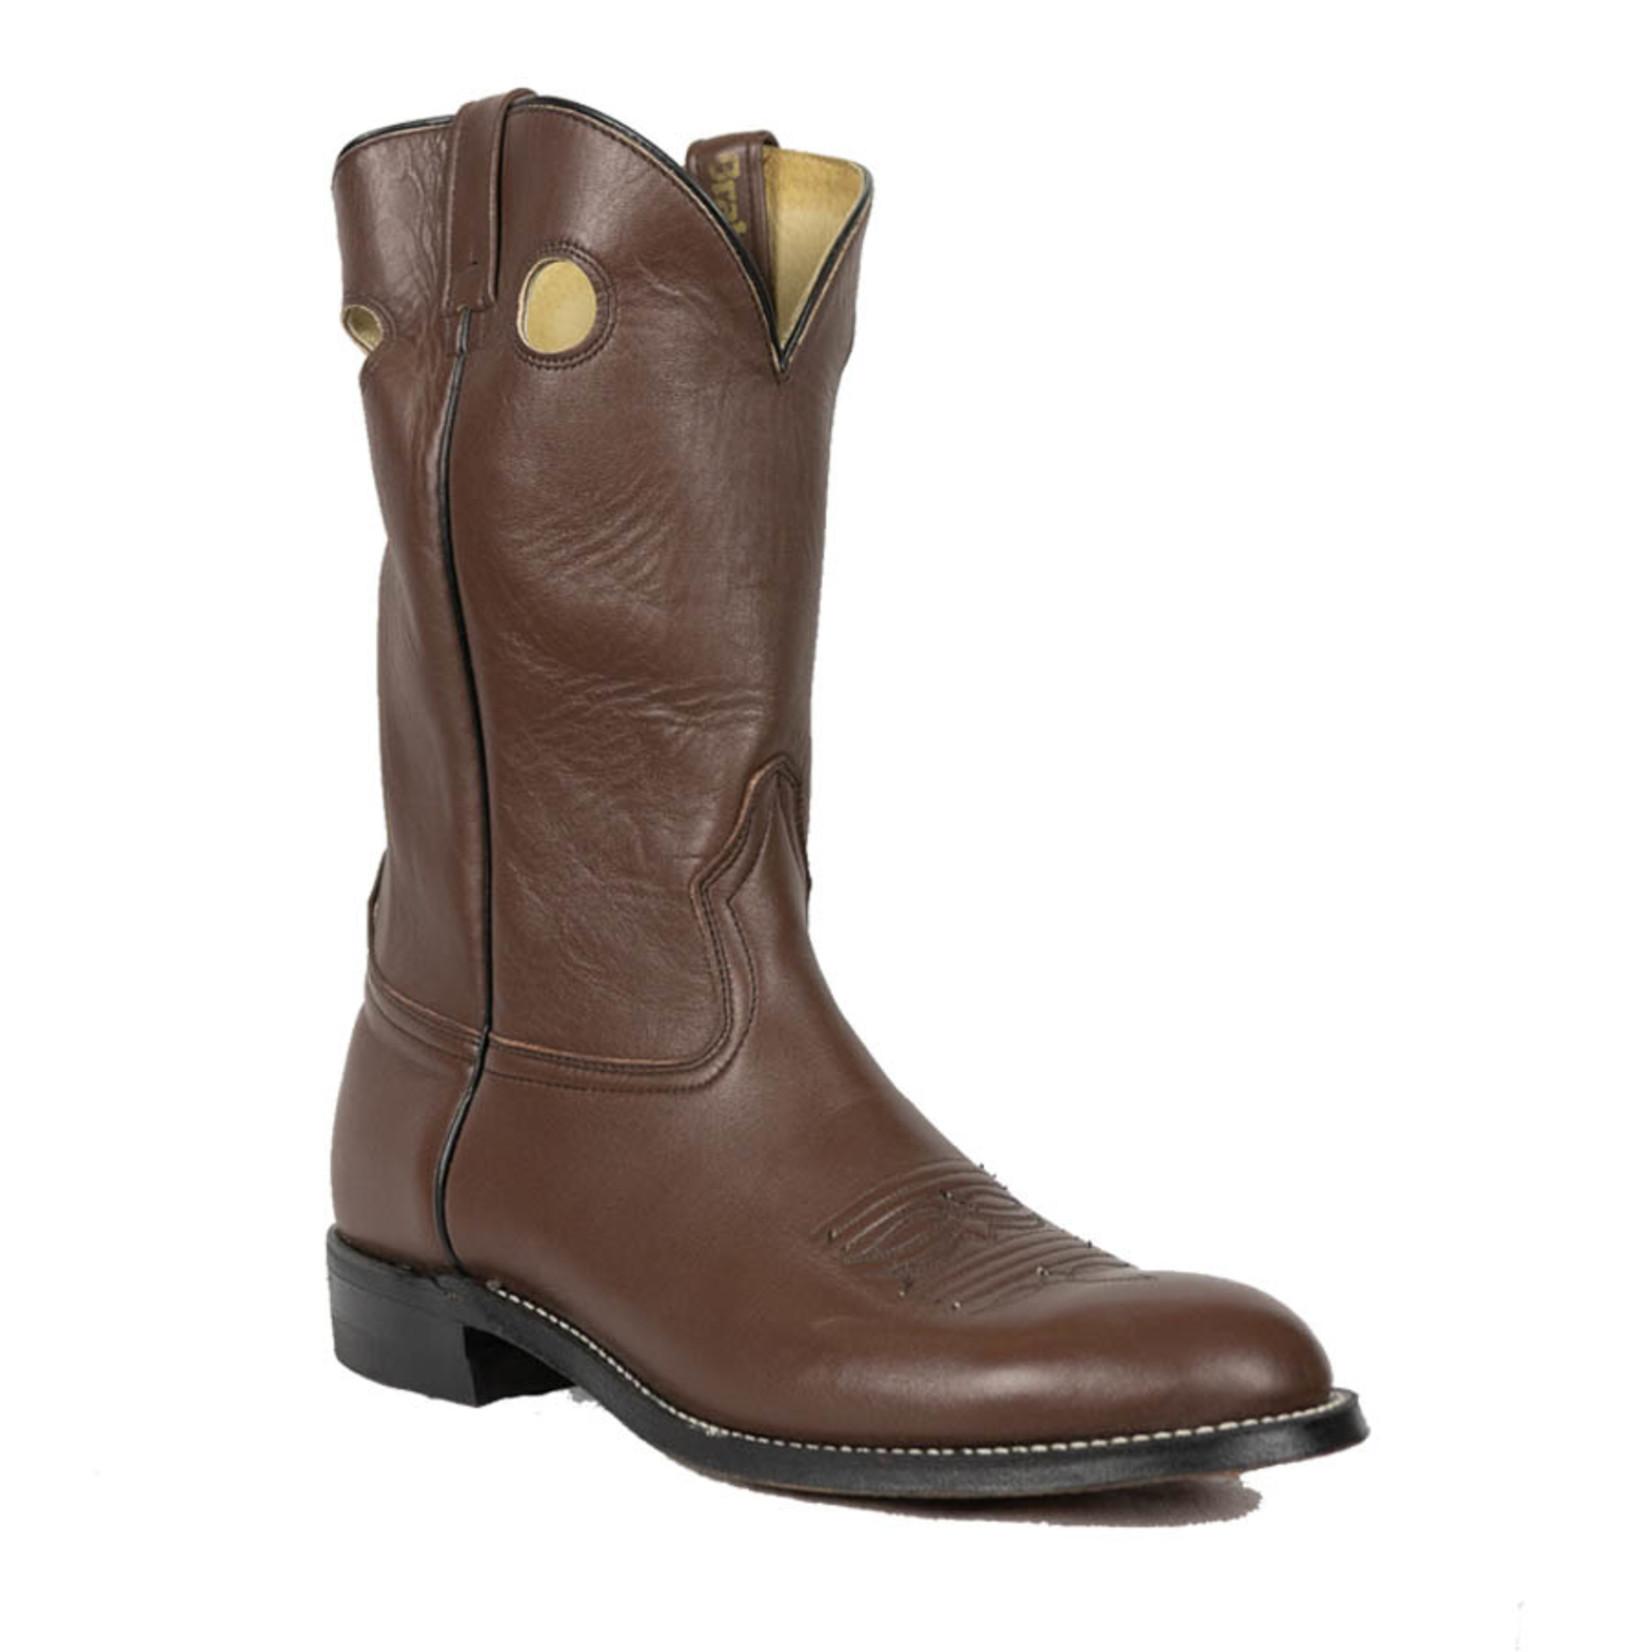 Brahma Brahma Men's Cowboy Boot 8085A